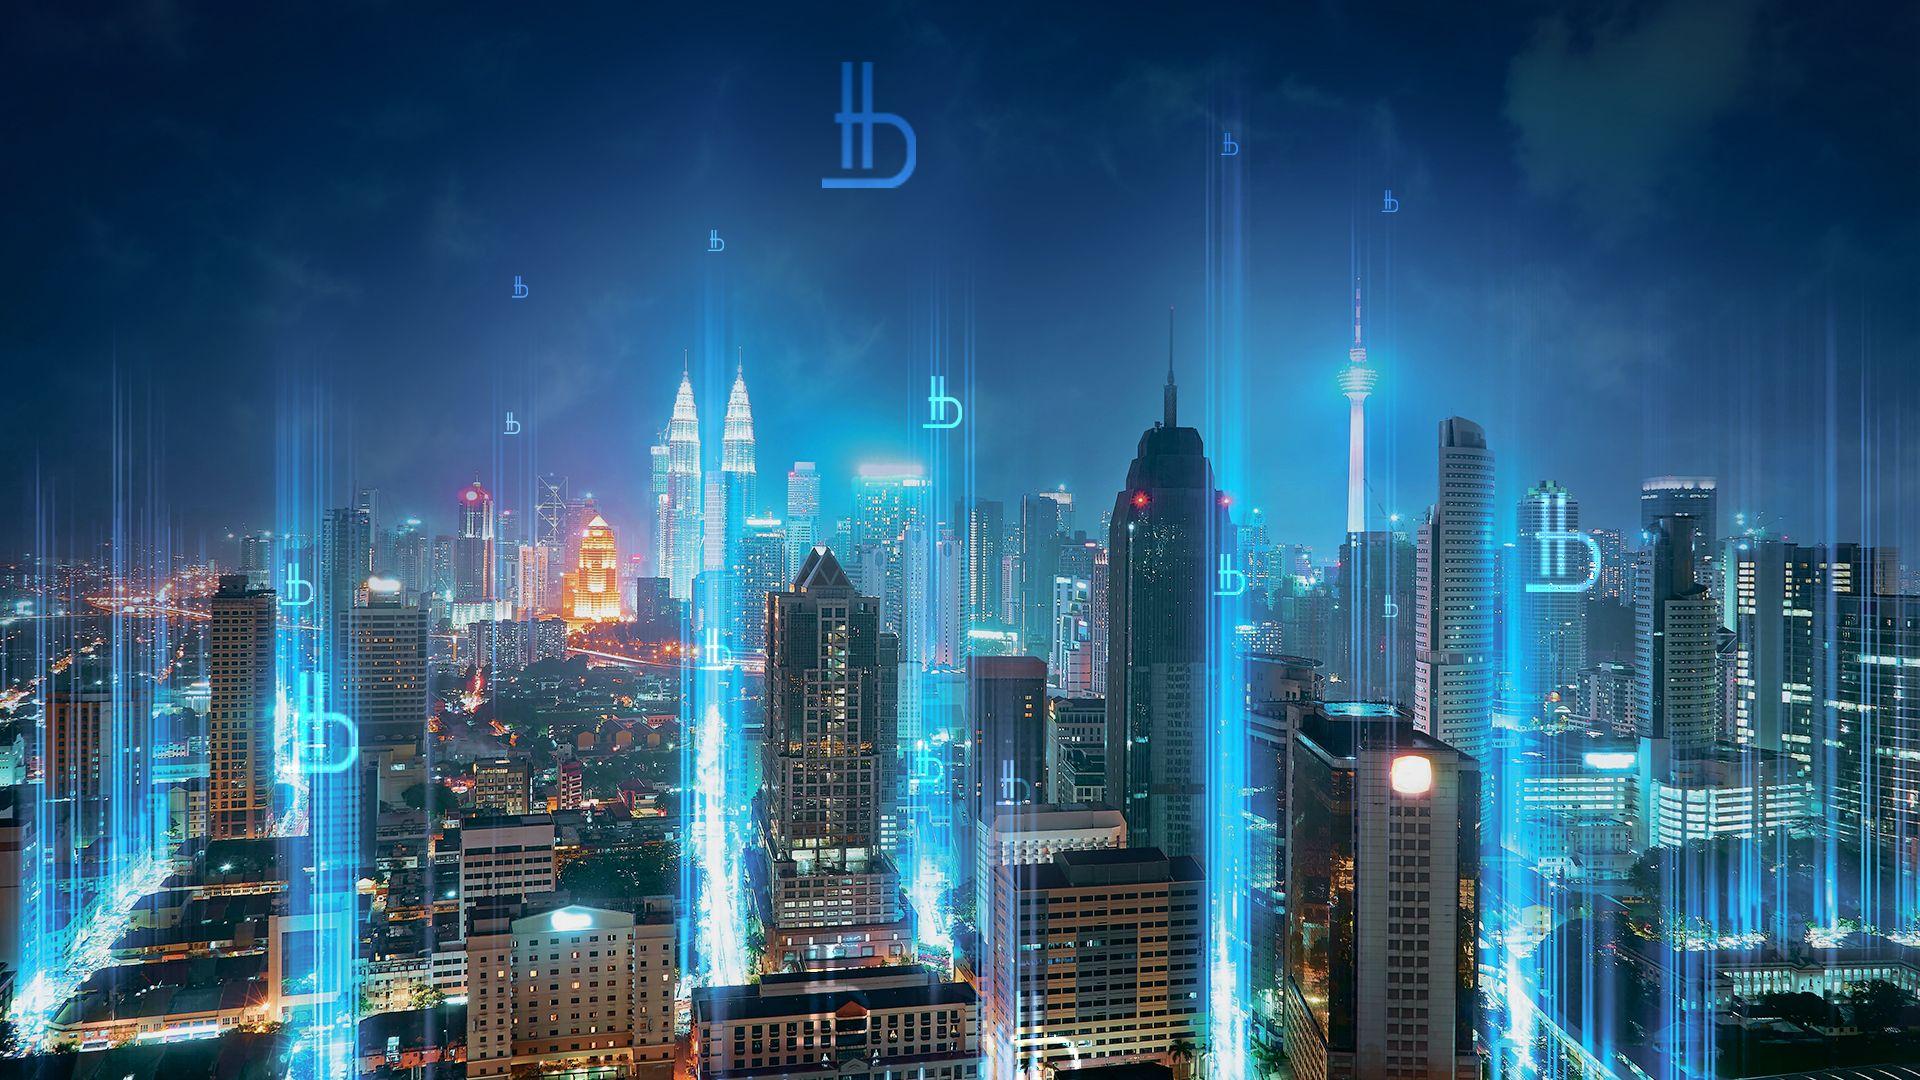 Digitalization Bitbon System Digital Transformation Digital Company Id Digital transformation wallpaper hd